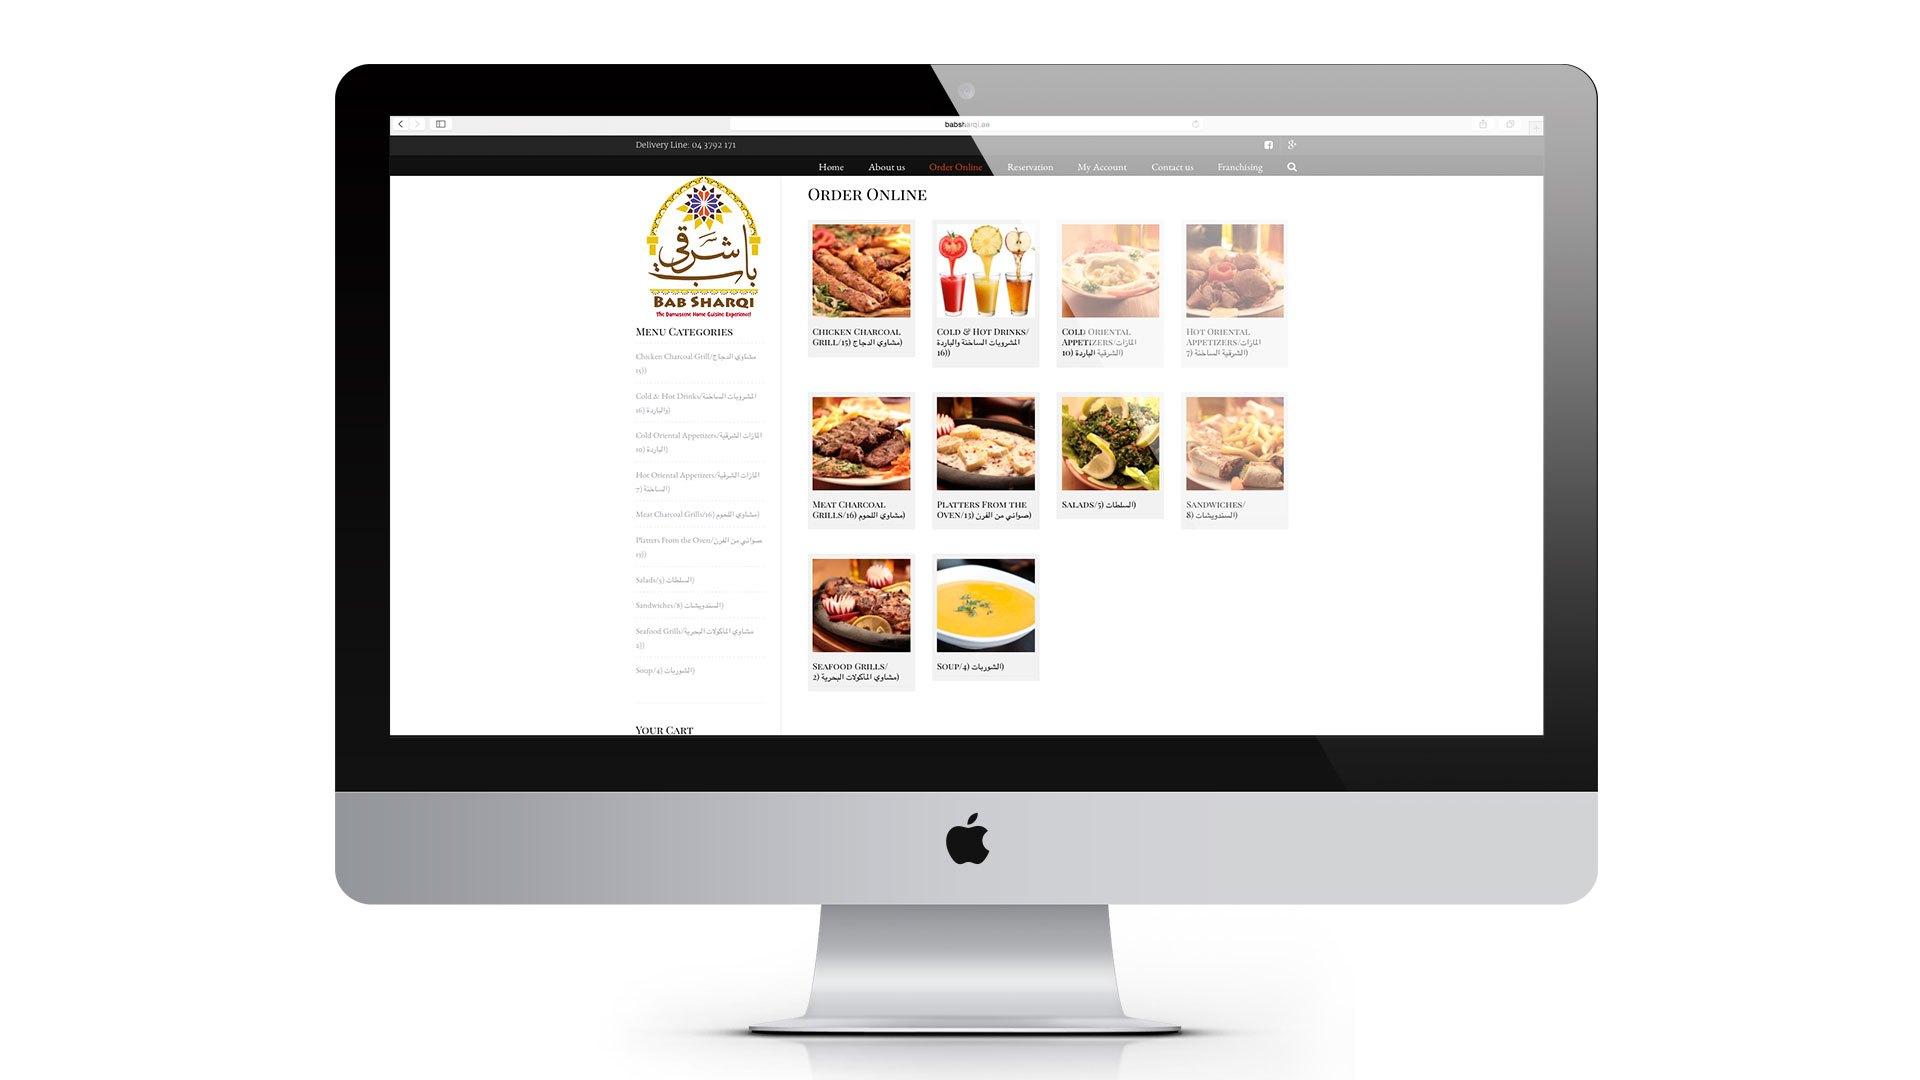 bab-sharqi-website-menu-page